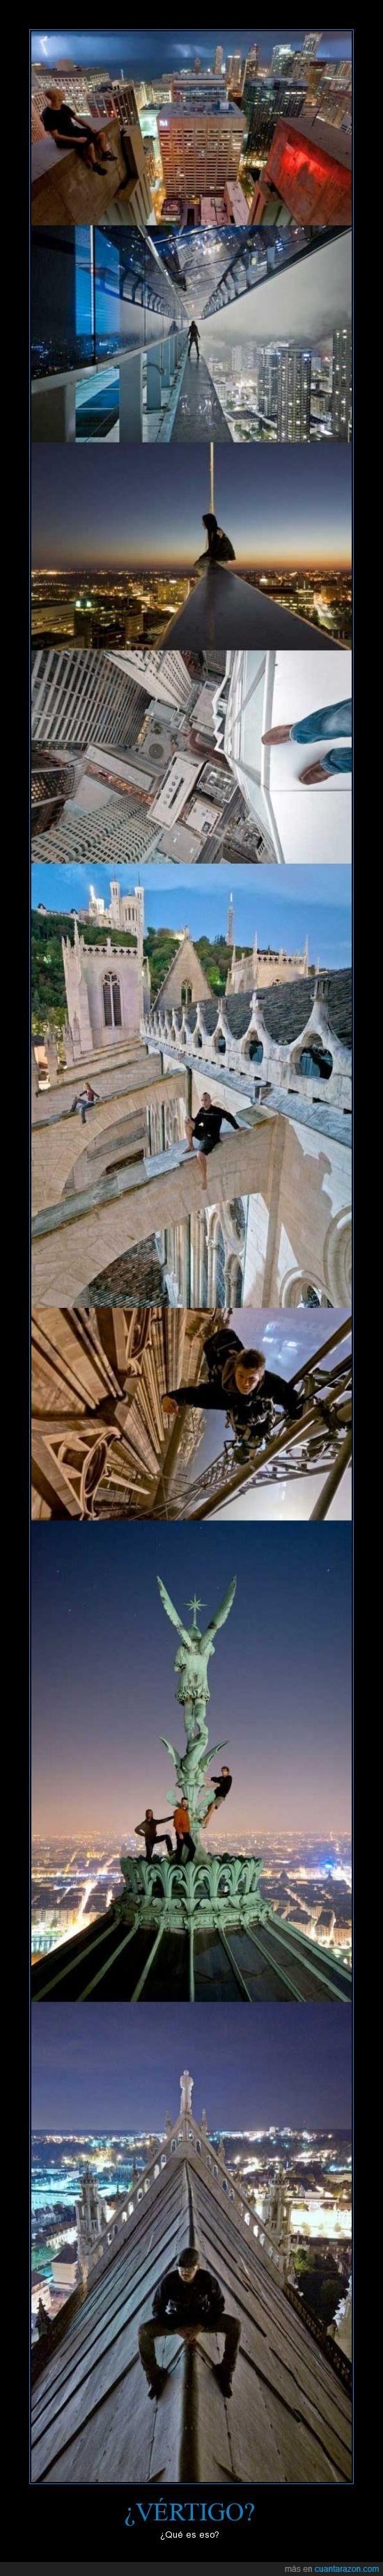 alto,altura,caer,cornisa. techo,edificio,locura,muerte segura,vértigo